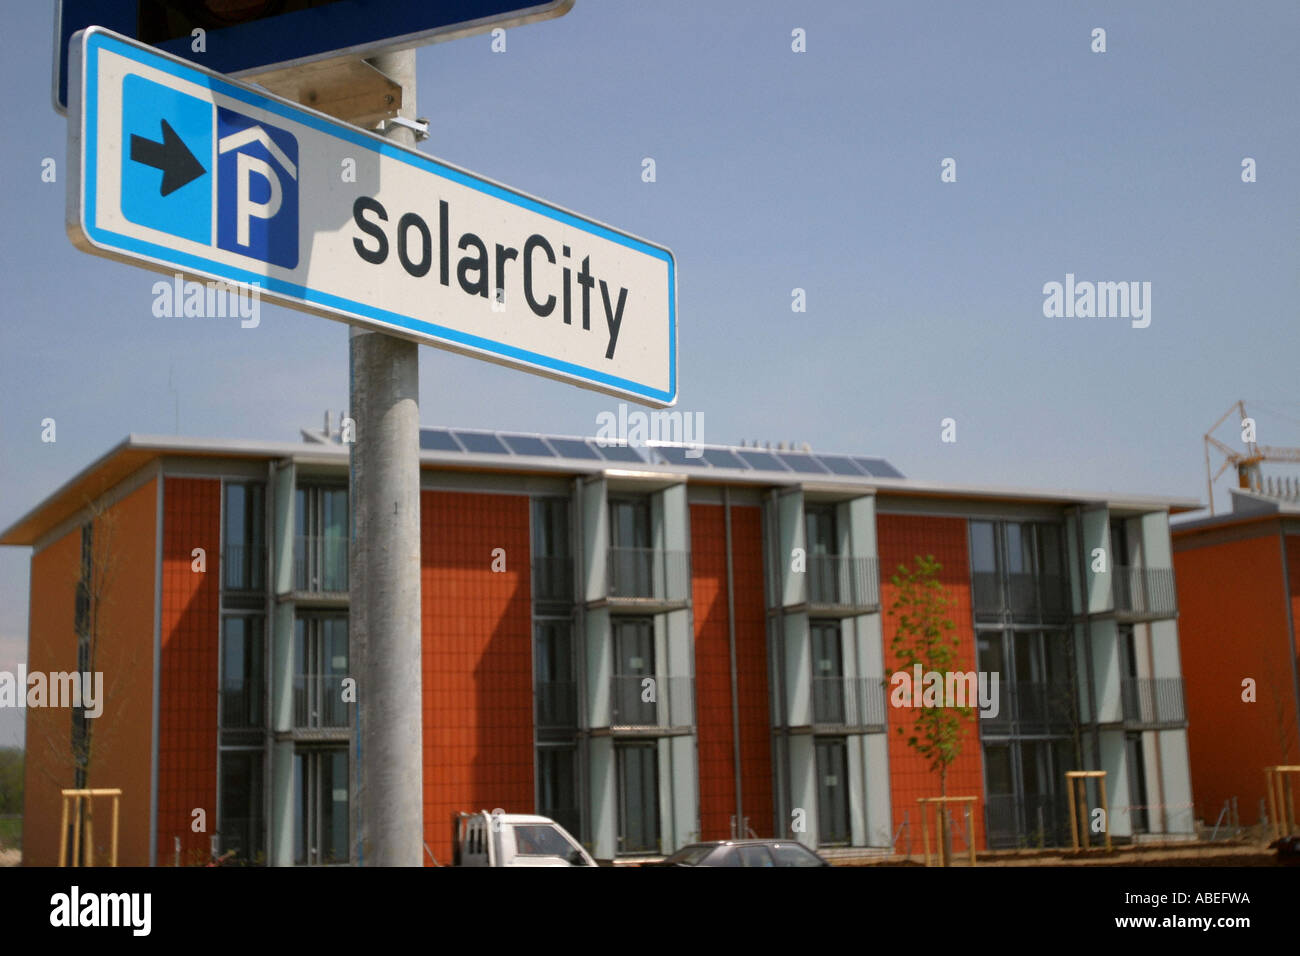 Solarcity Stock Photos Amp Solarcity Stock Images Alamy